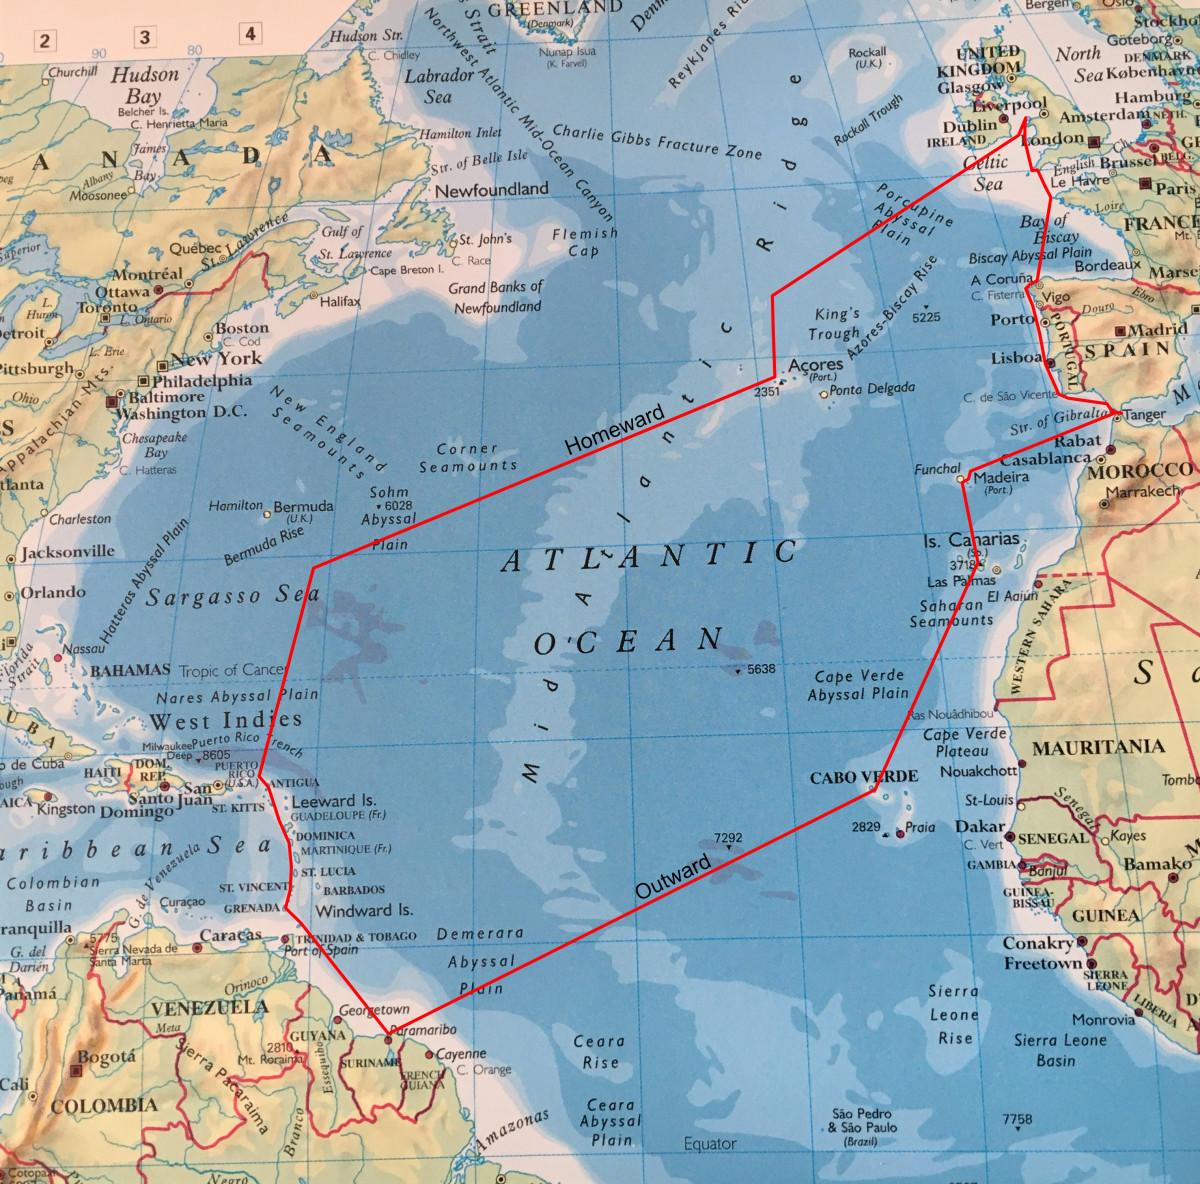 The Atlantic Voyage of Plancius 2018-2019